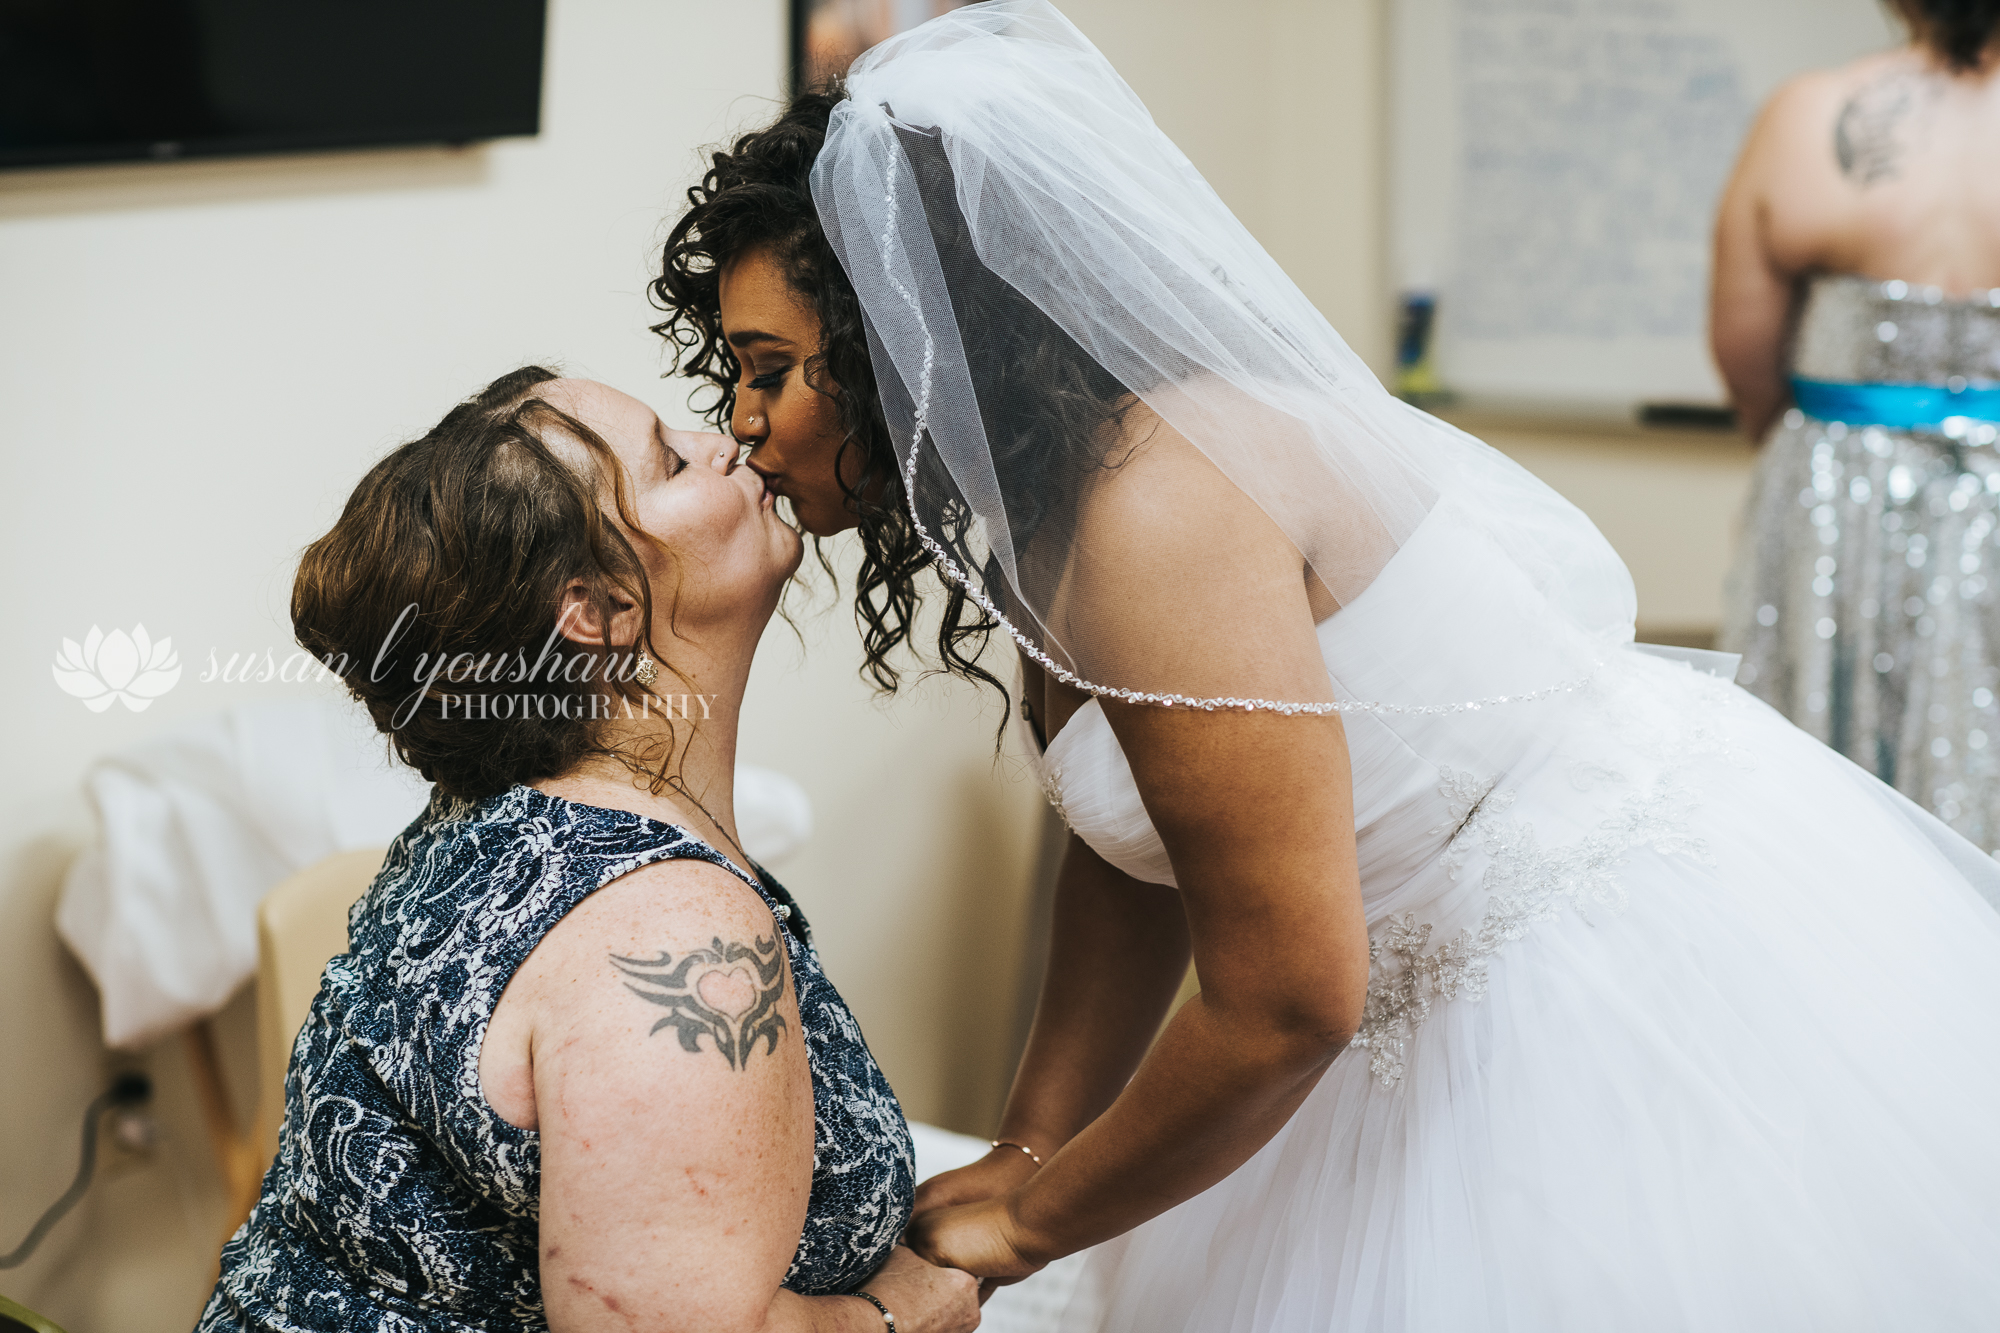 Katelyn and Wes Wedding Photos 07-13-2019 SLY Photography-13.jpg